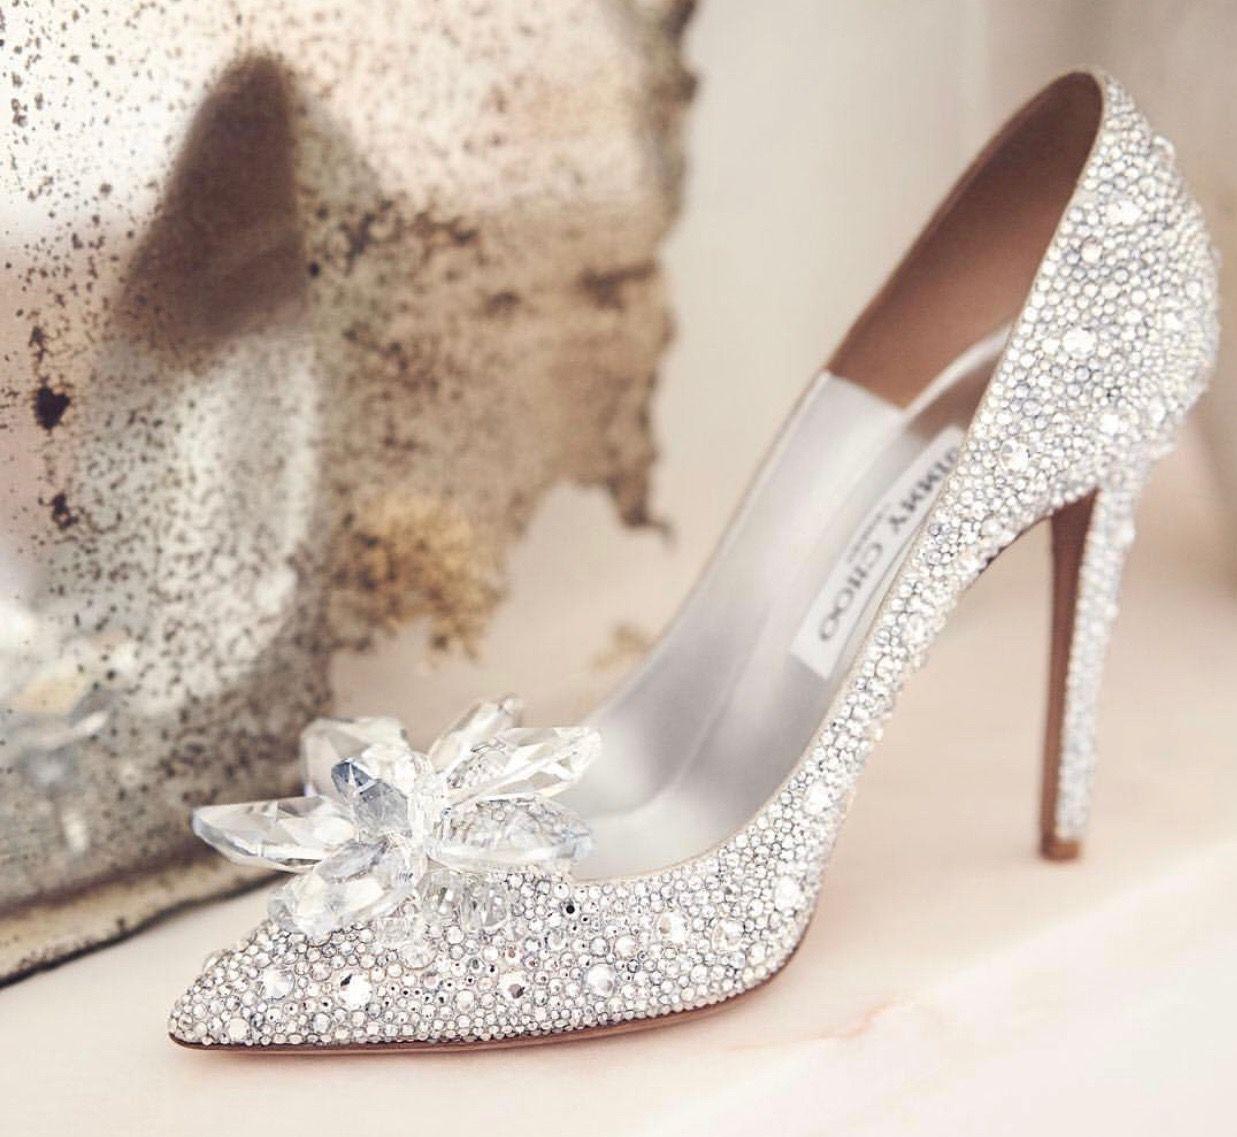 ee589e7a4 Jimmy Choo Avril Ciderella Stiletto 2019 #shoes #shoesaddict #sandals  #zapatos #estilo #fashion #style #vanessacrestto #stiletto